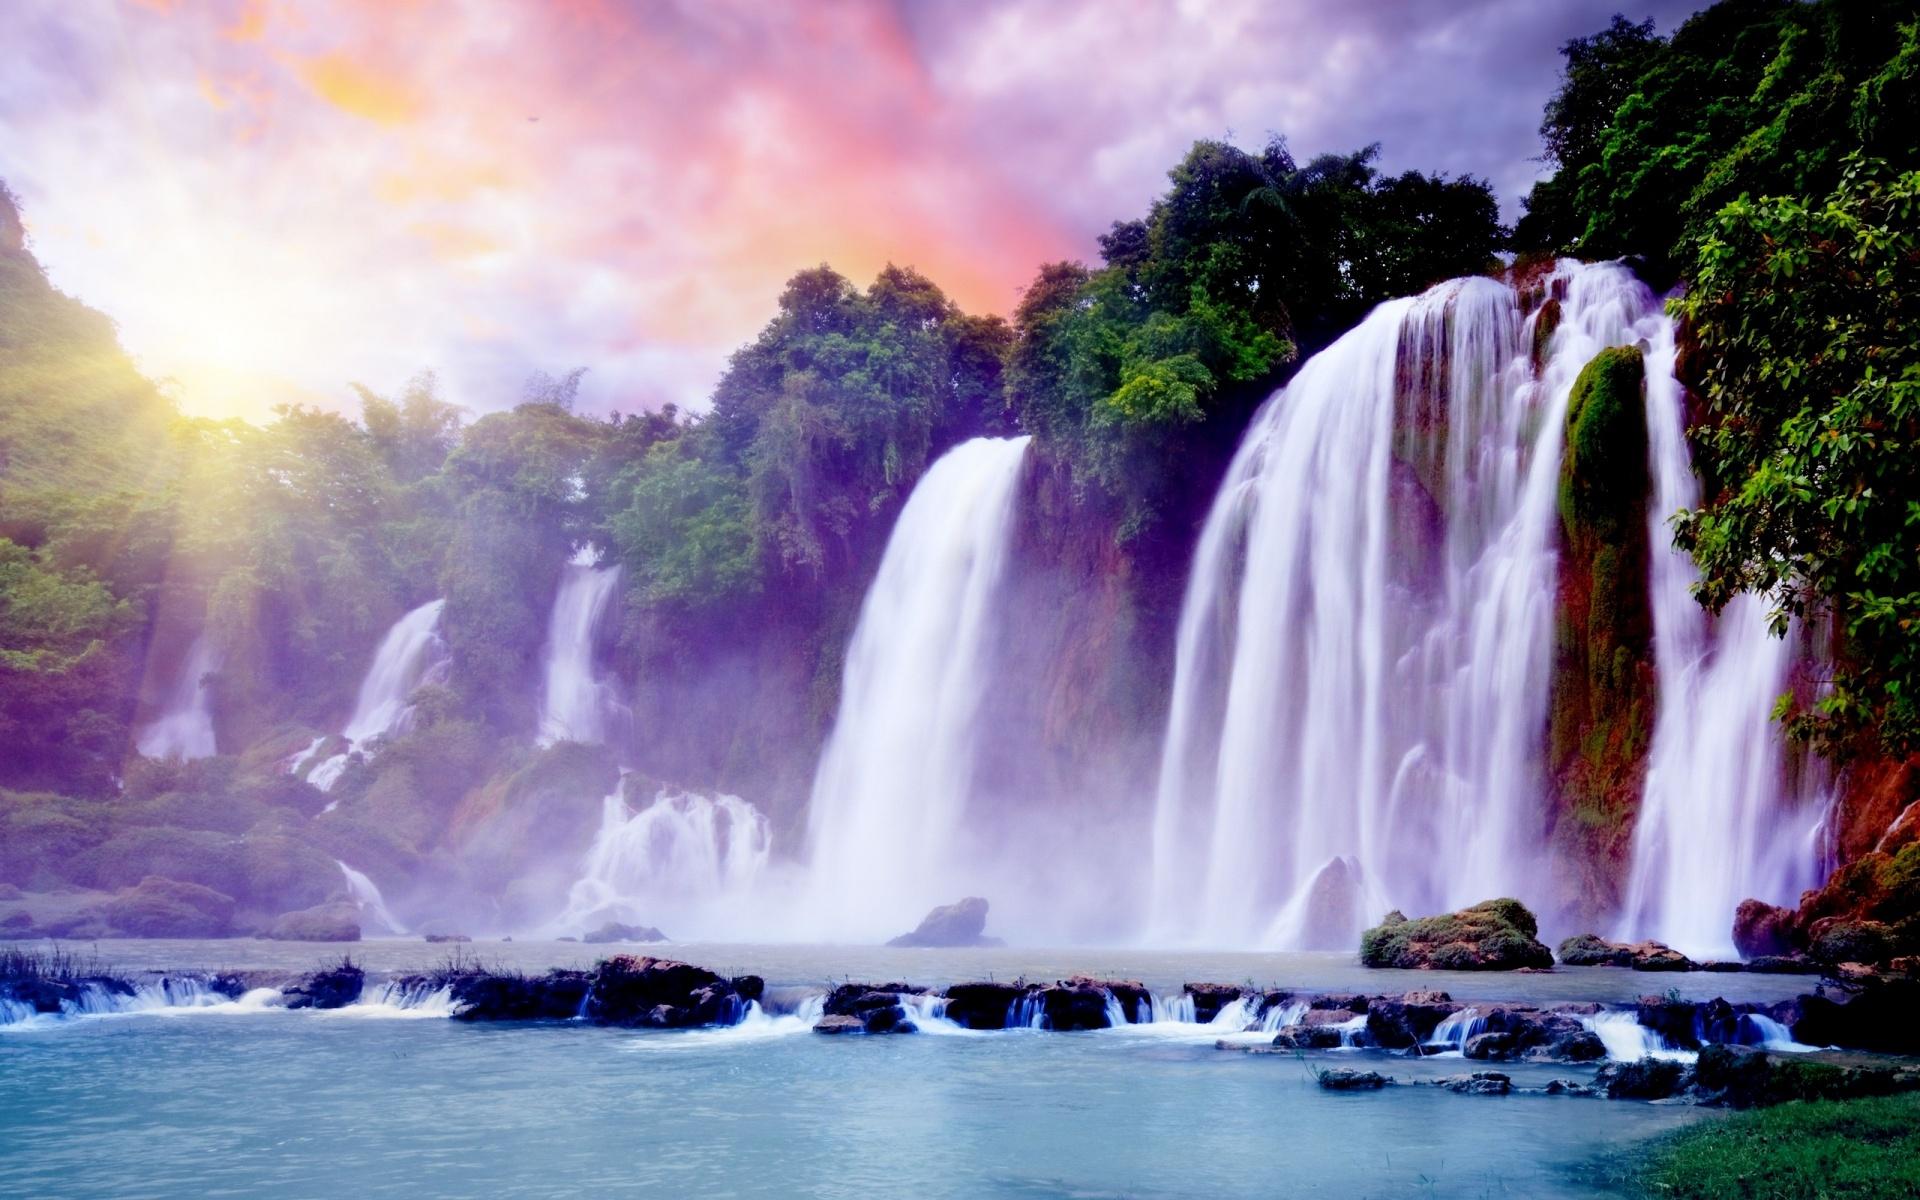 20 Gorgeous Hd Waterfall Wallpapers: Most Beautiful Waterfall Wallpaper